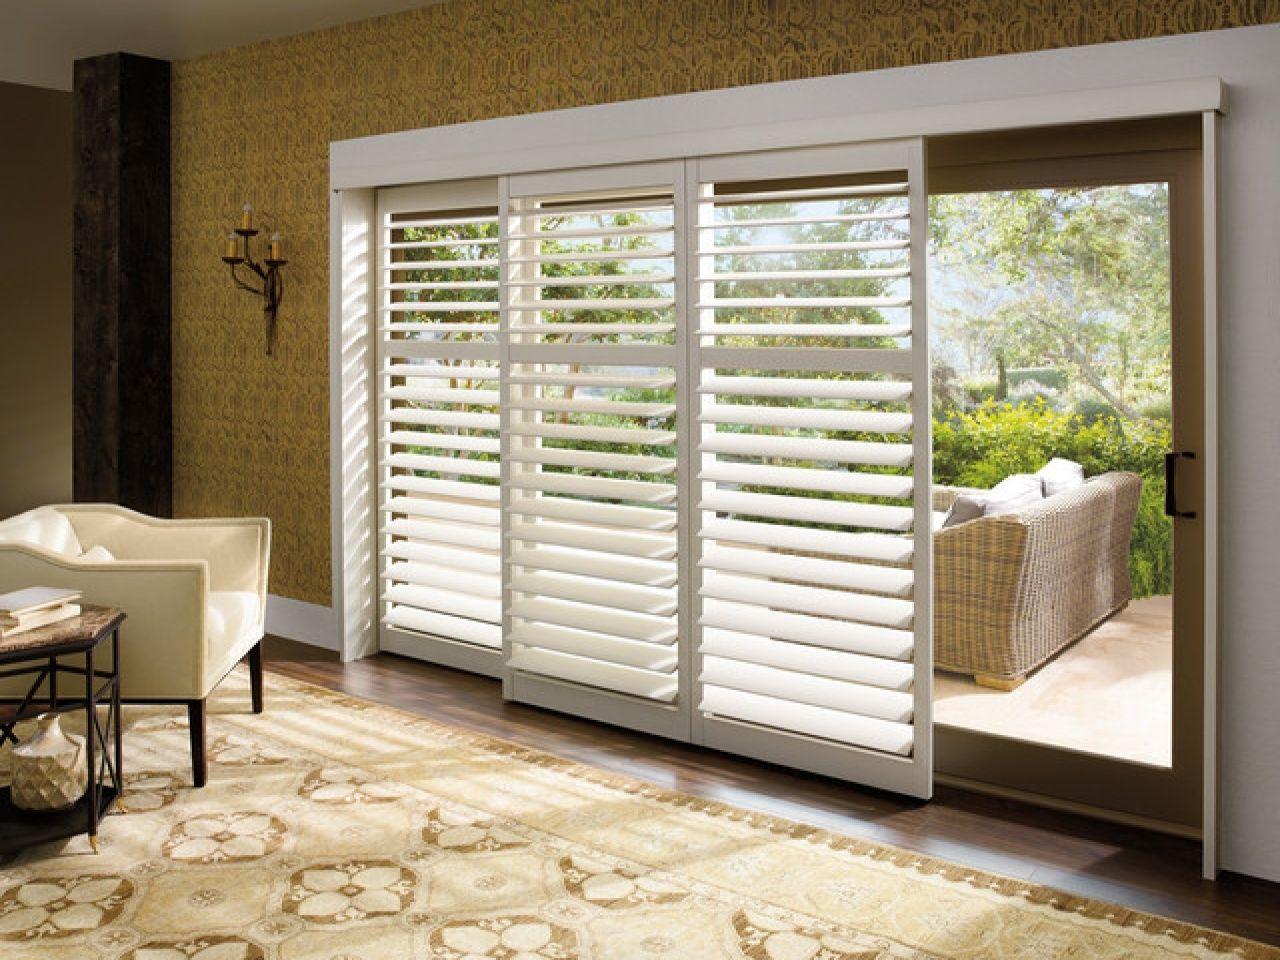 Window shade for sliding glass door togethersandia